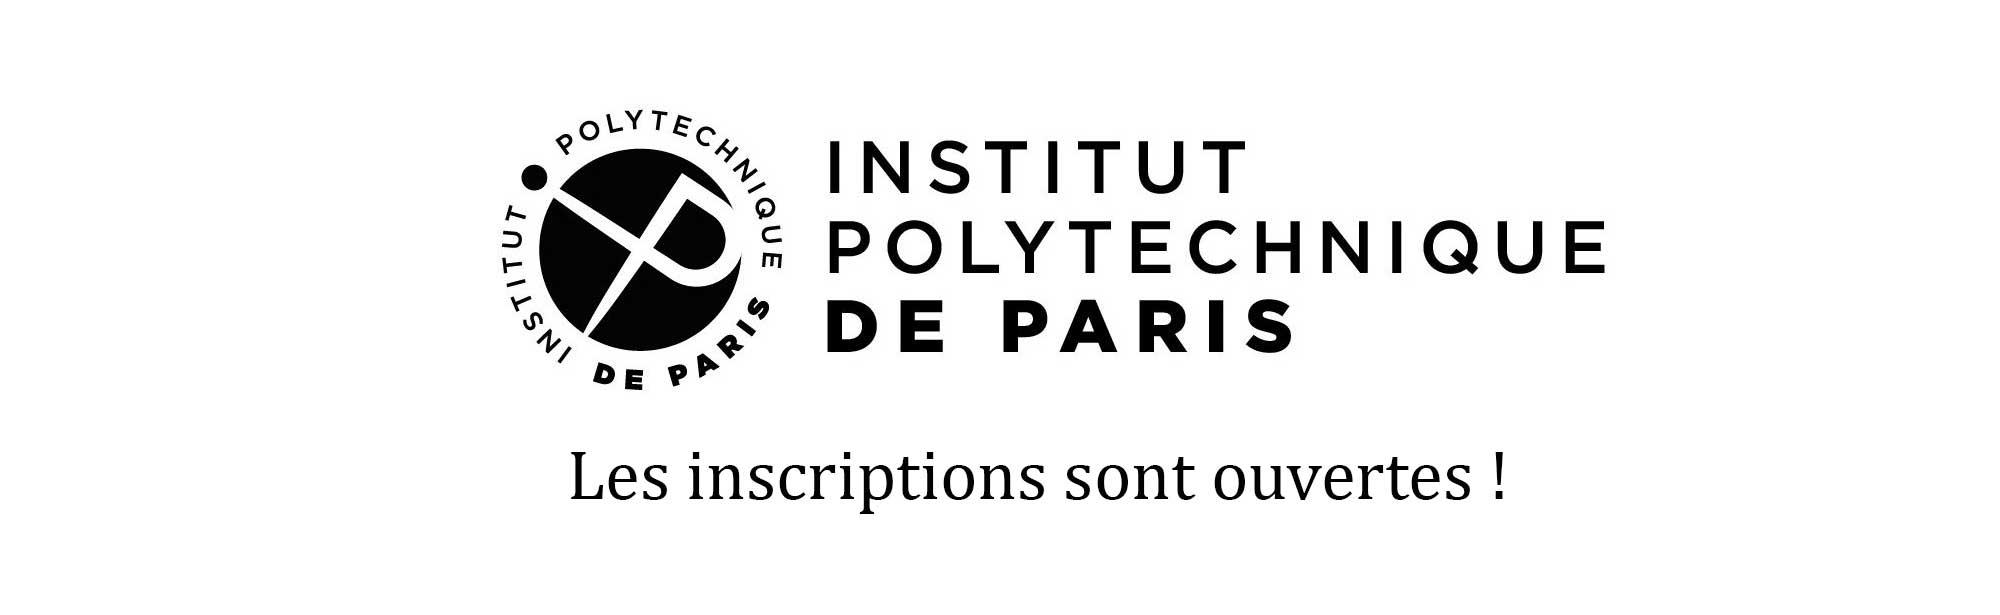 https://programmes.polytechnique.edu/sites/default/files/revslider/image/IPParis.jpg